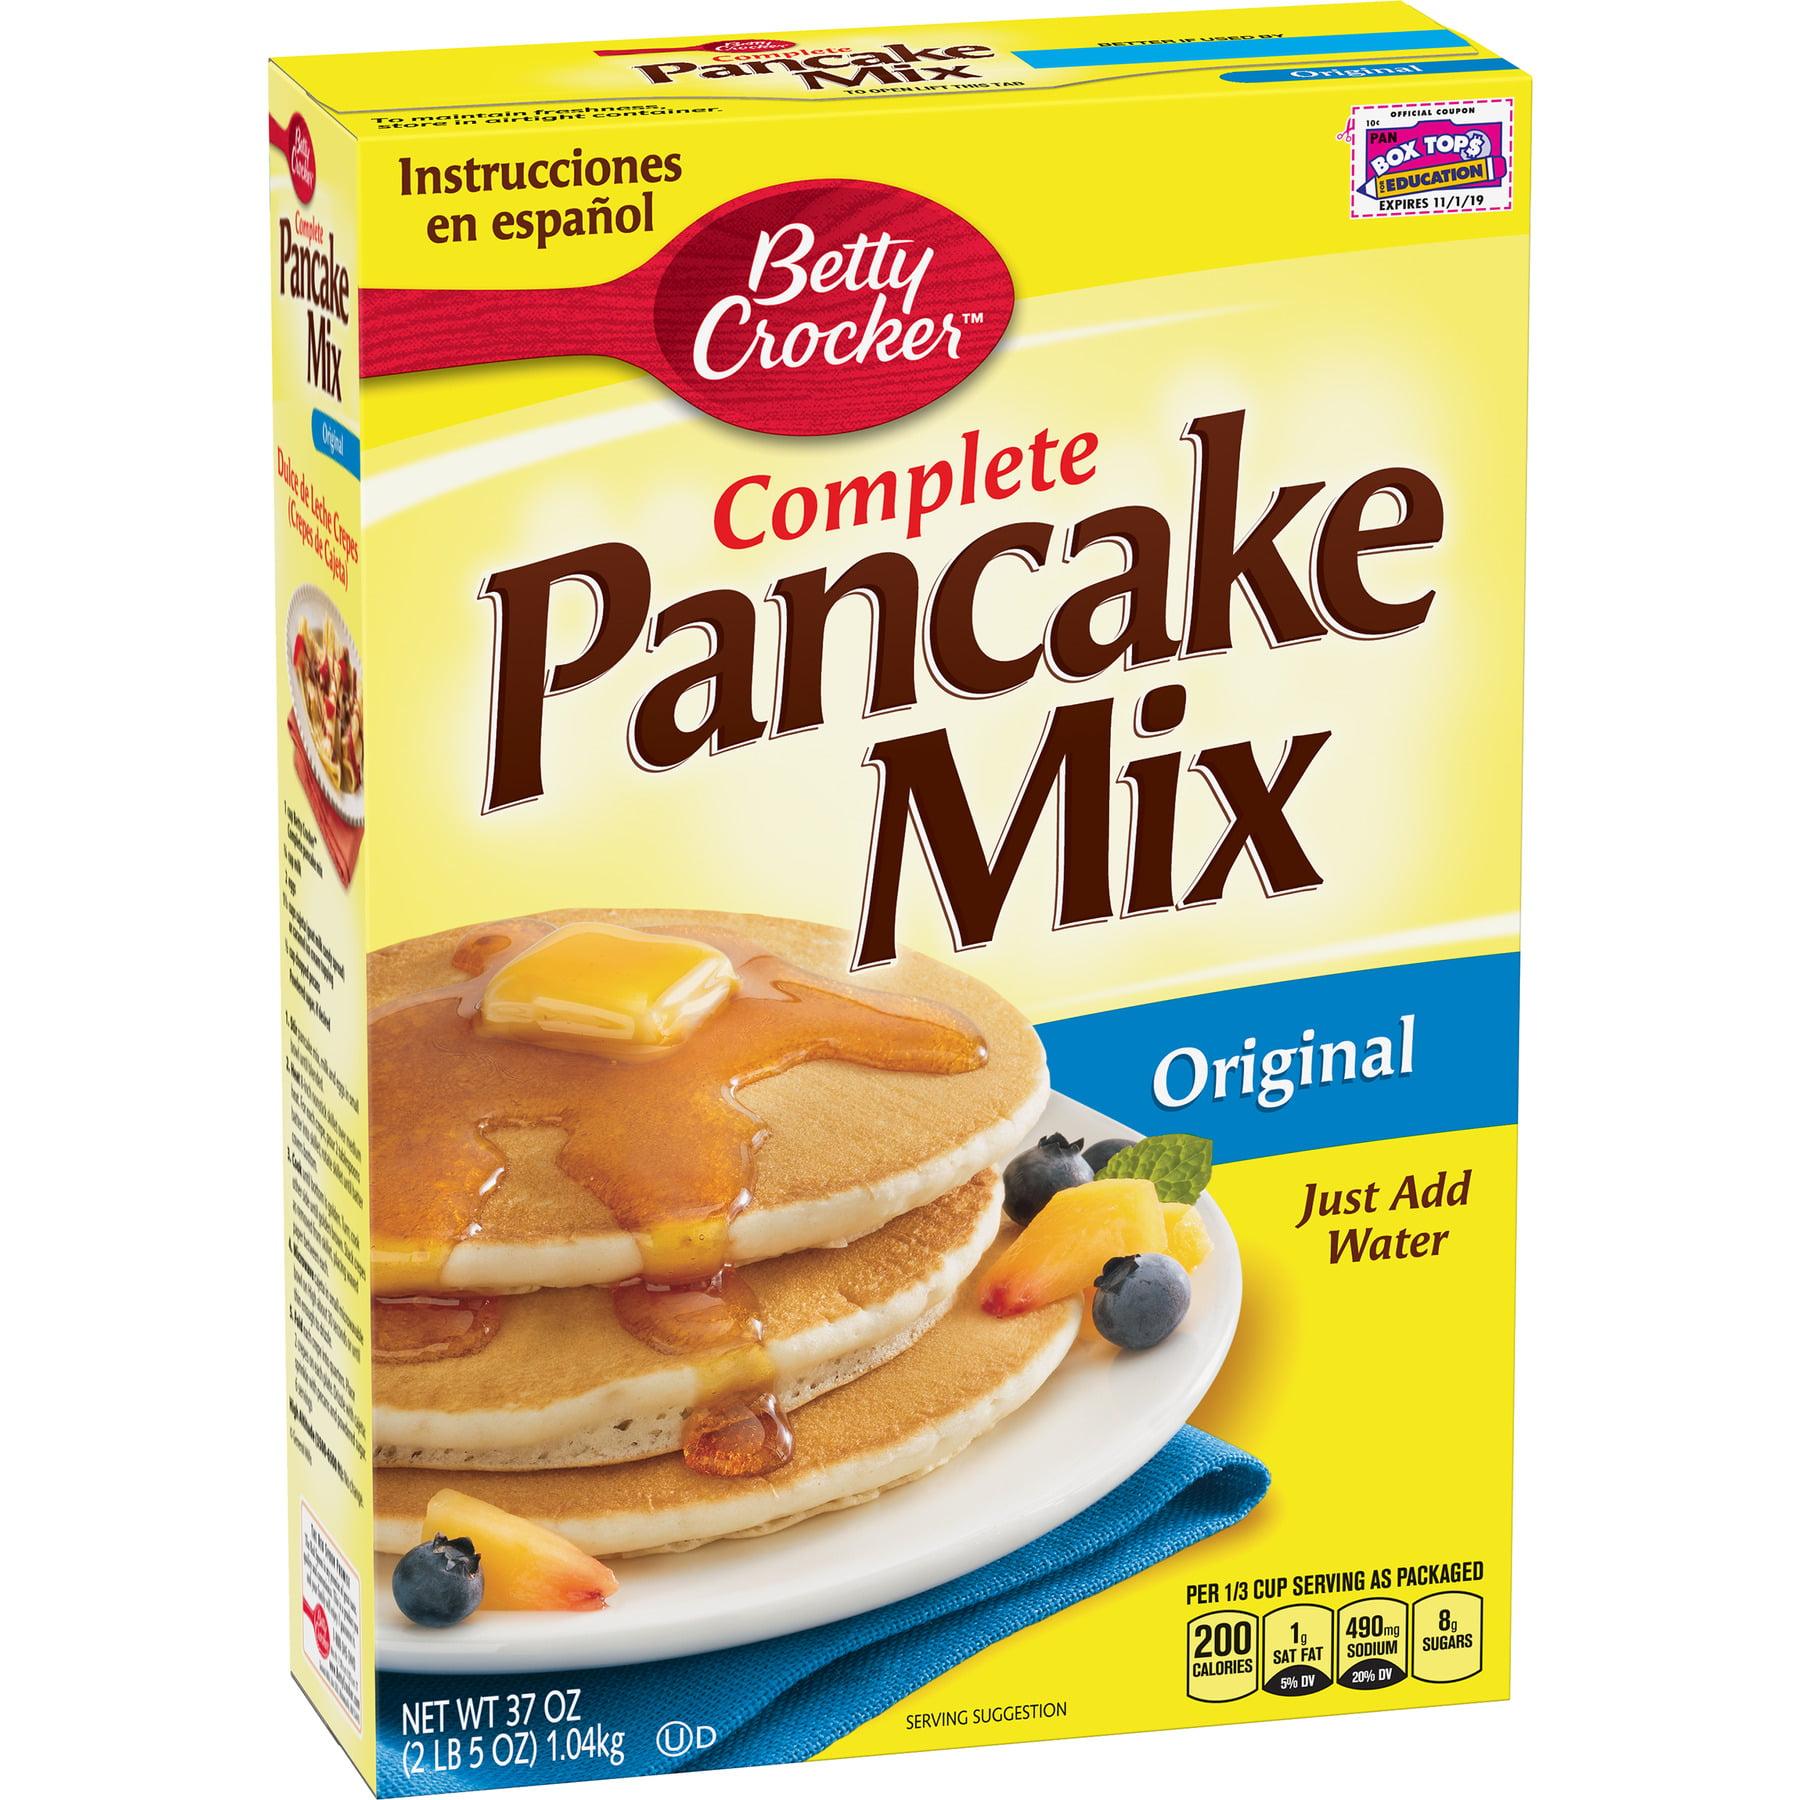 Betty Crocker Bisquick Baking Mix Complete Pancake Mix Original 37